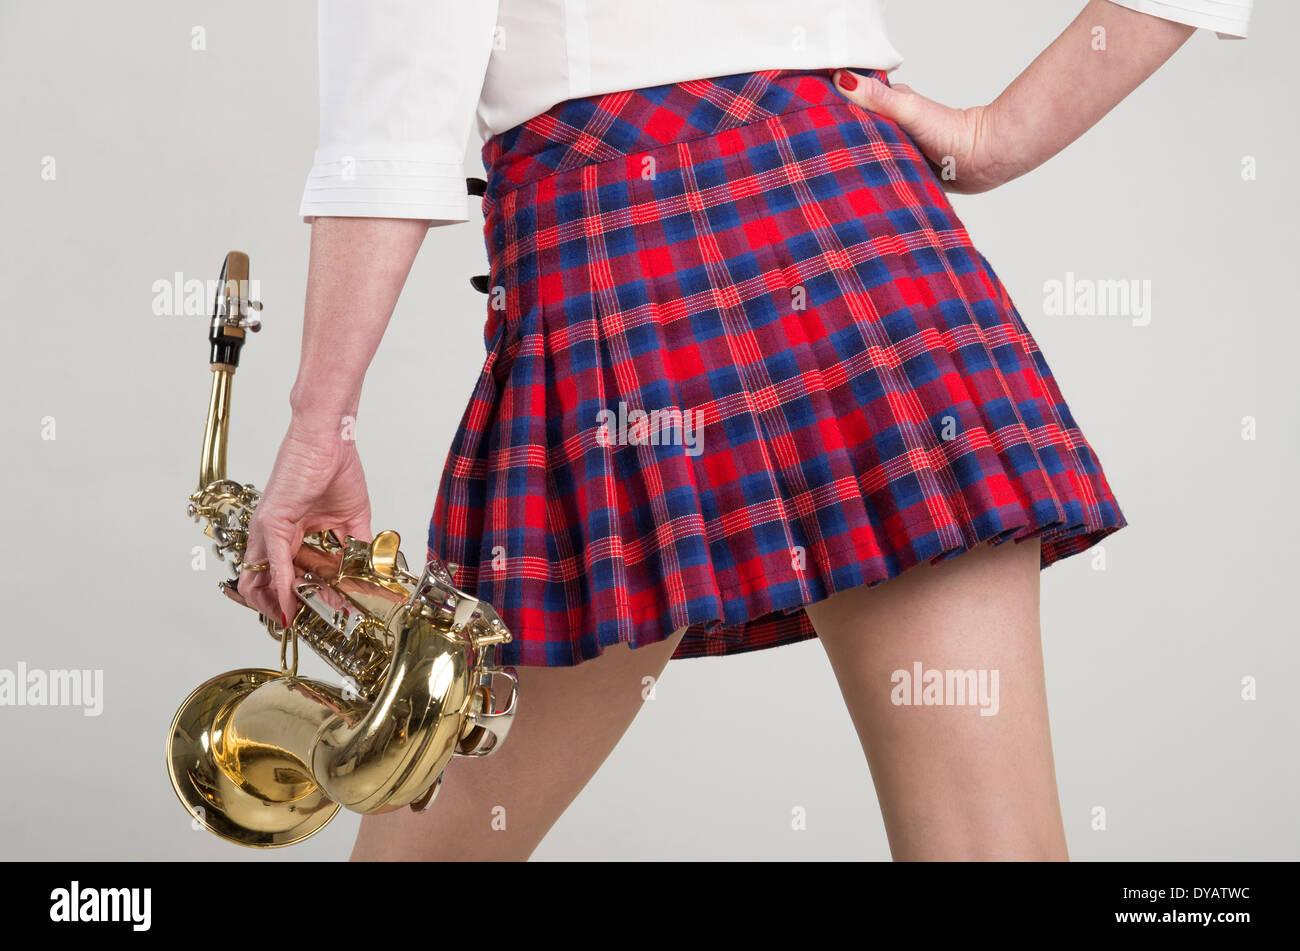 Woman In Short Tartan Skirt Carrying A Saxophone Sax